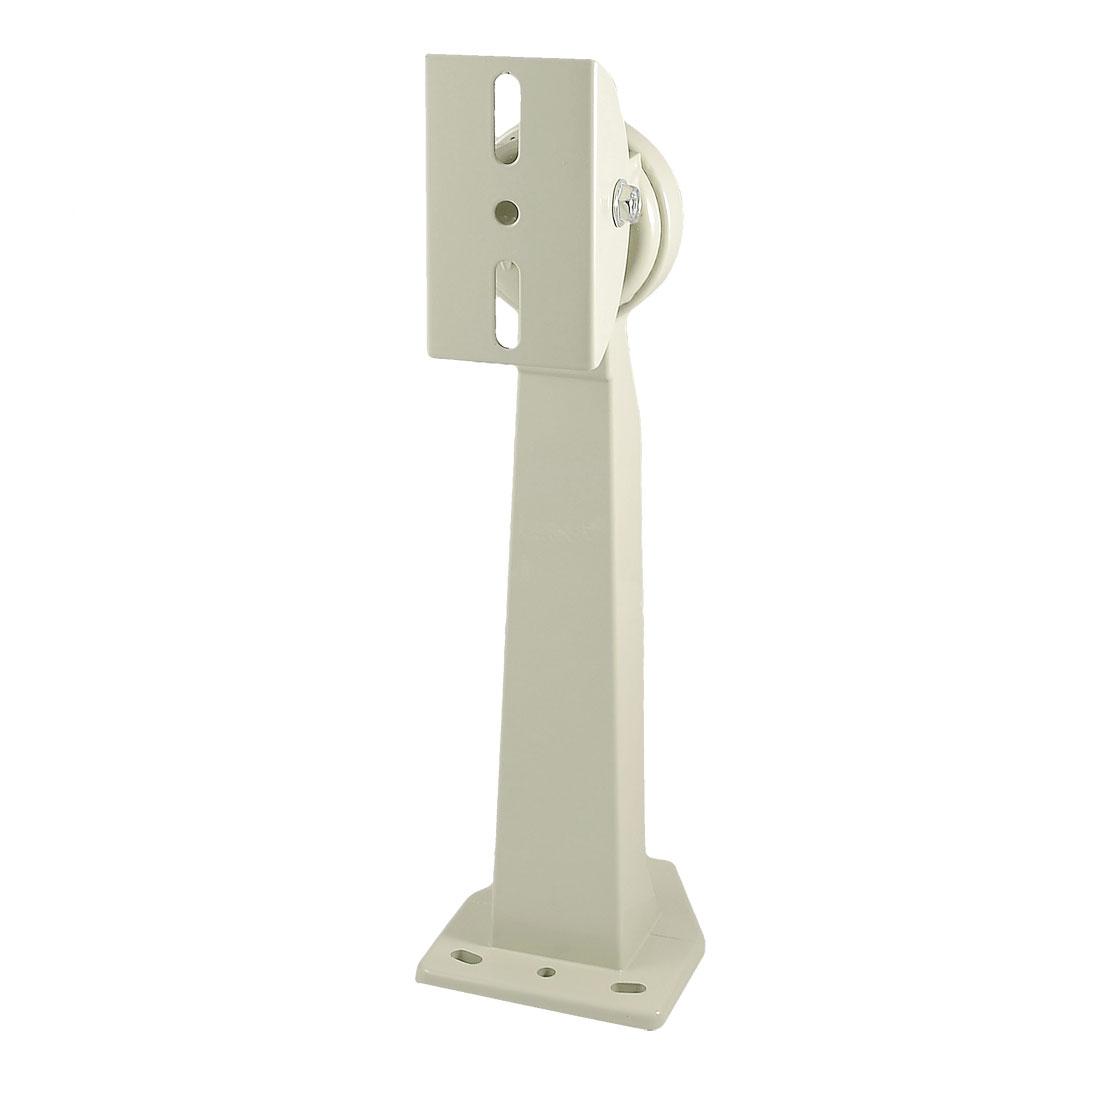 "Metal Wall Mounted Surveillance CCTV Camera Stand Bracket White 12"" Height"